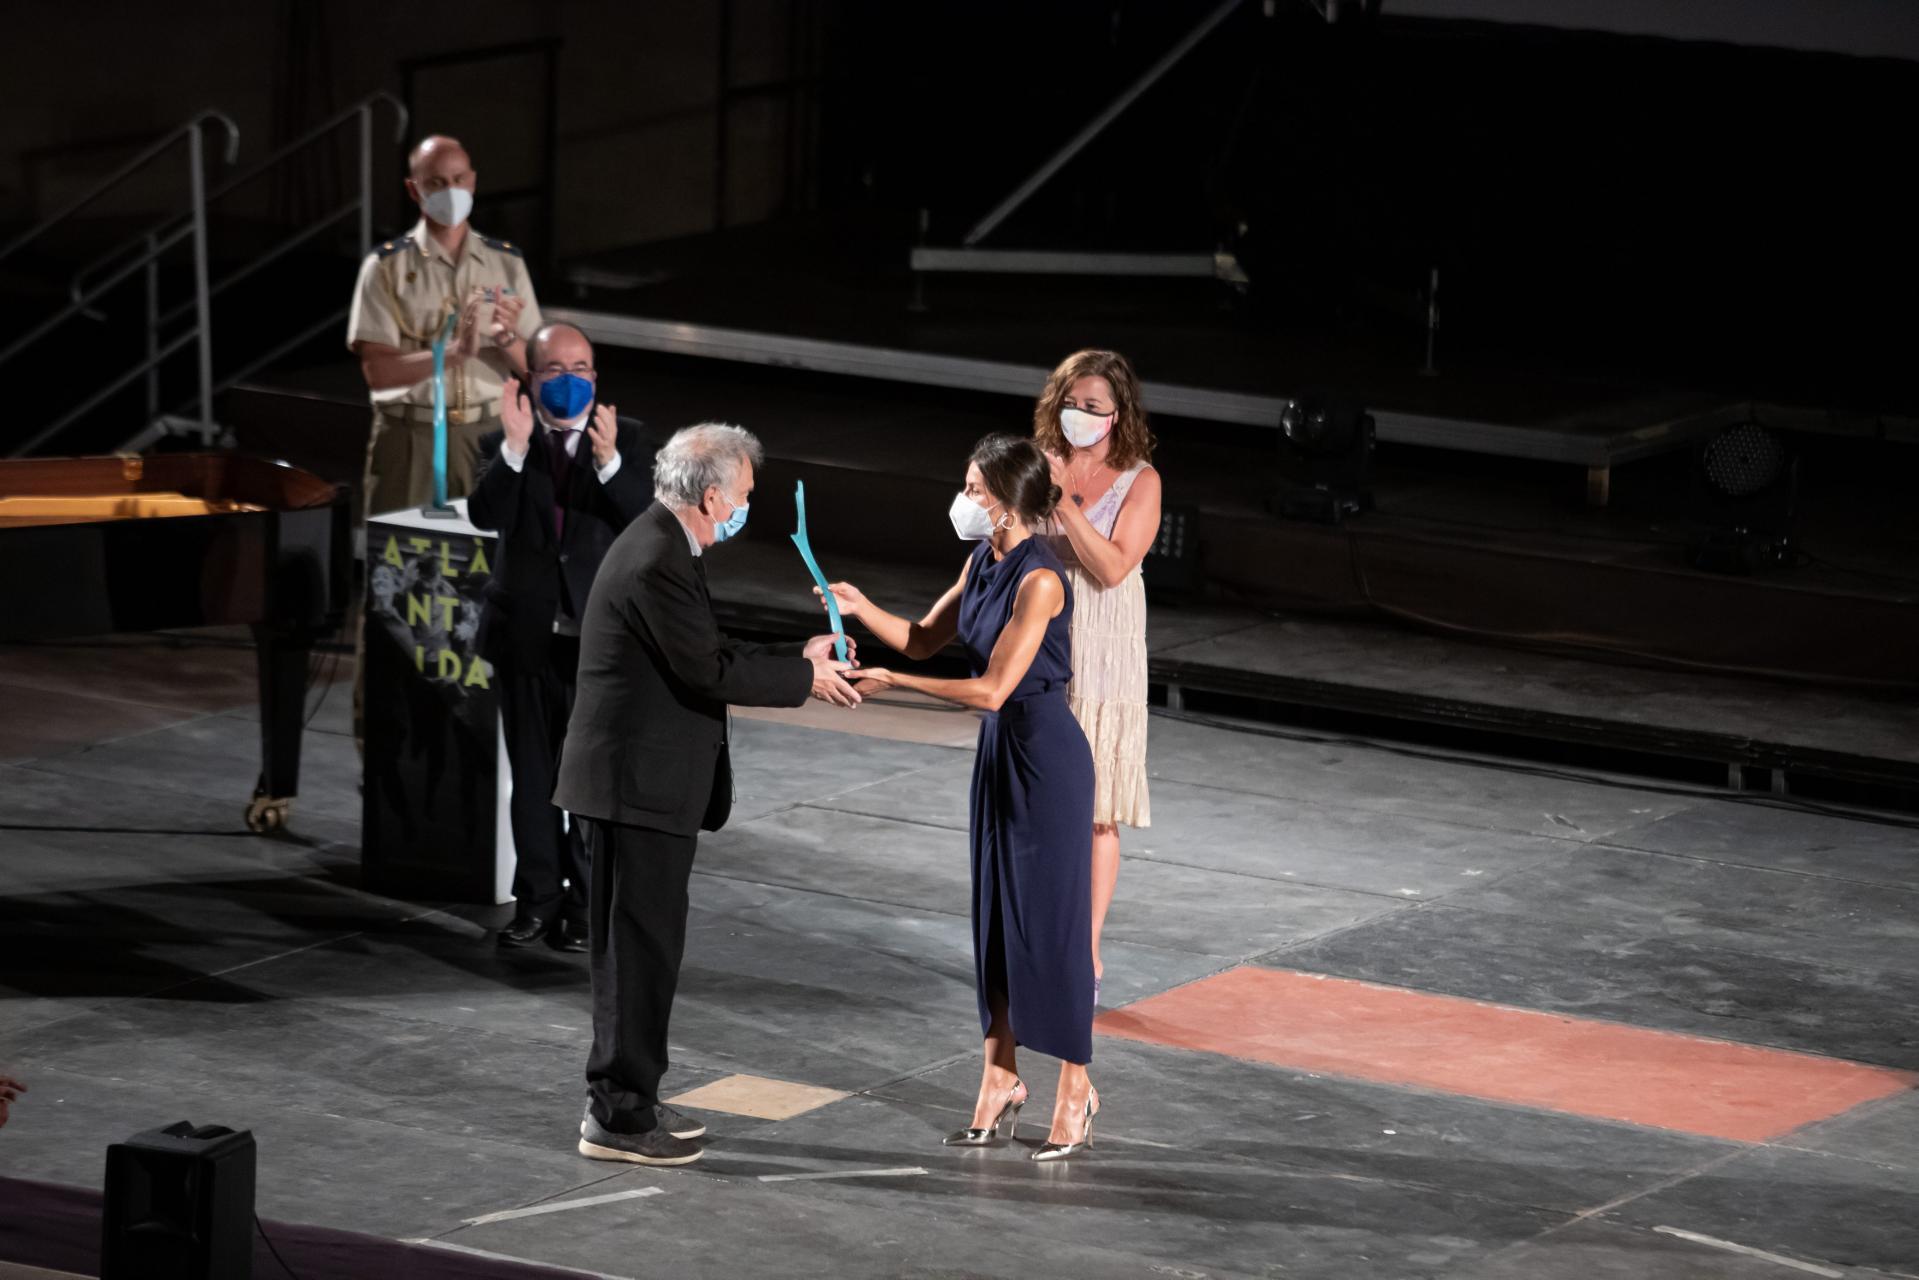 palma clausura atlantida fil festival 2021 con la reina letizia